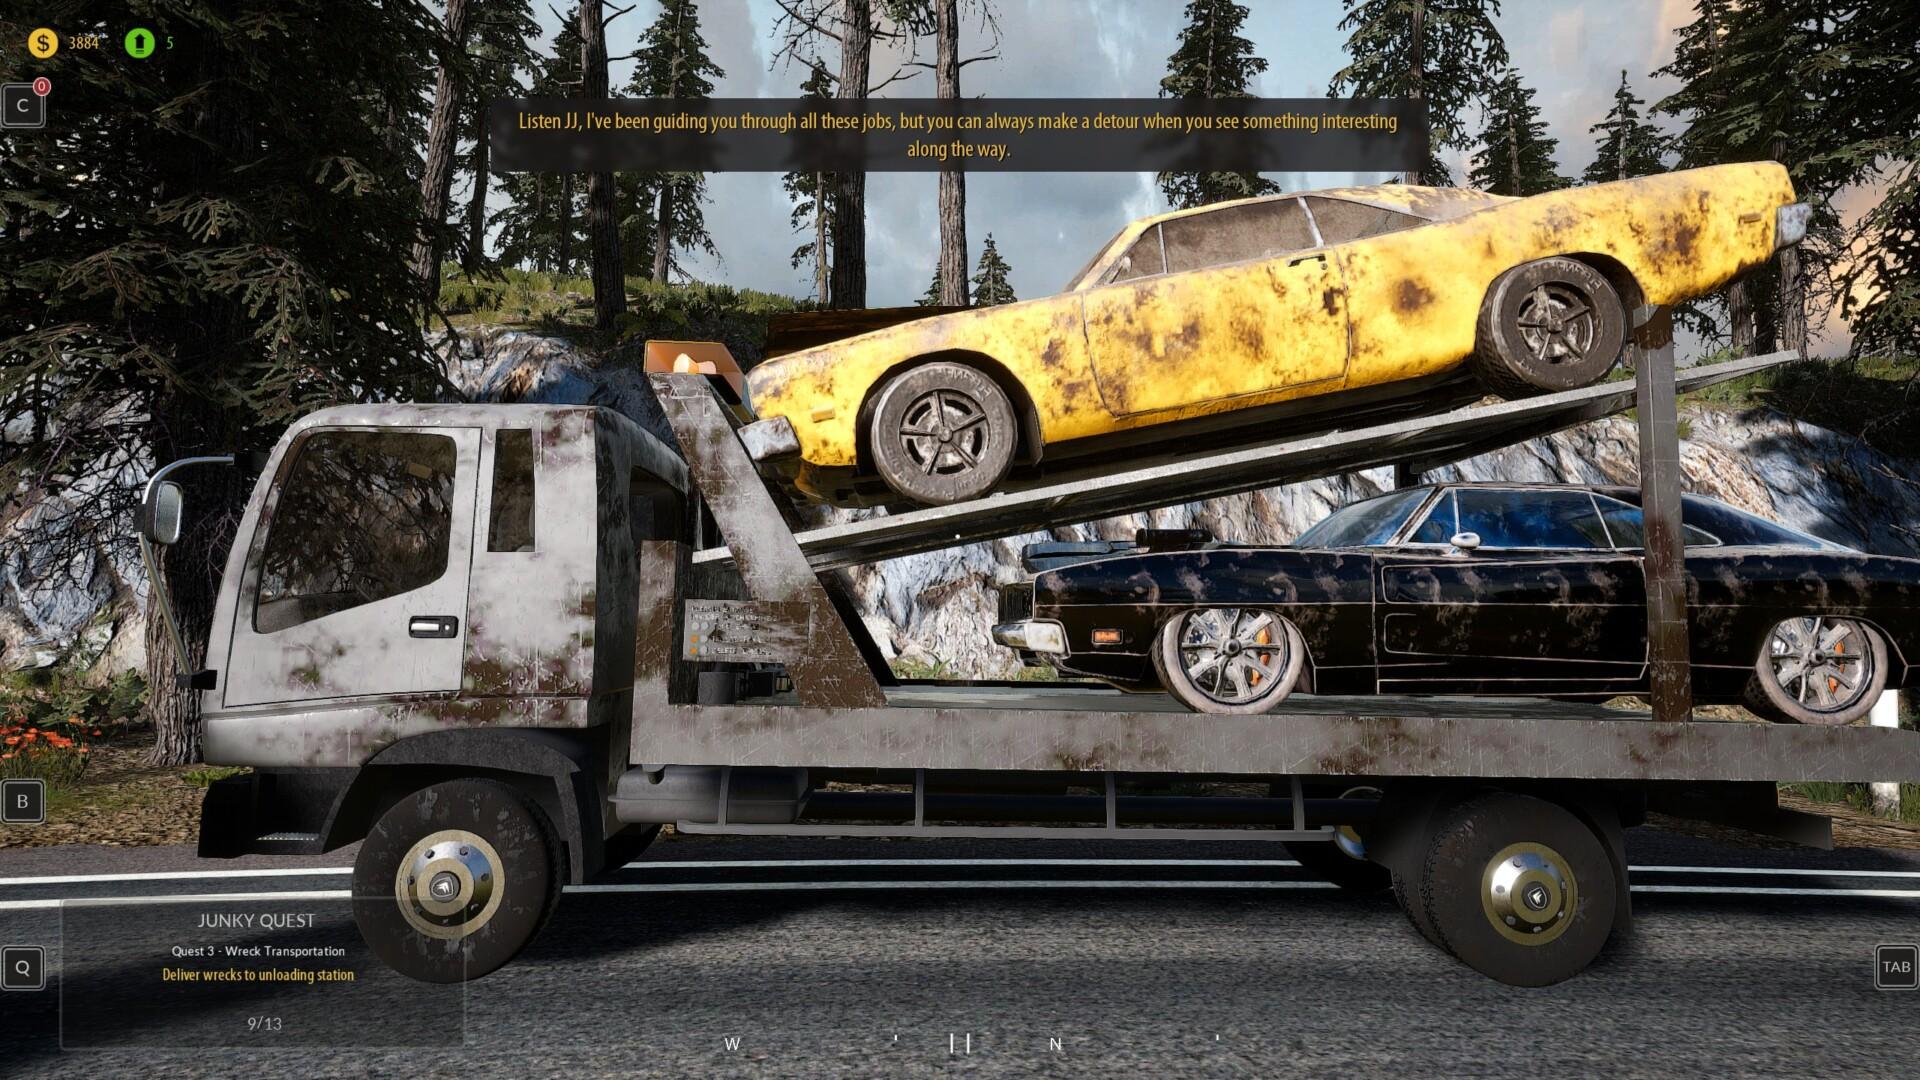 junkyard-simulator-early-access-—-is-it-worth-it?